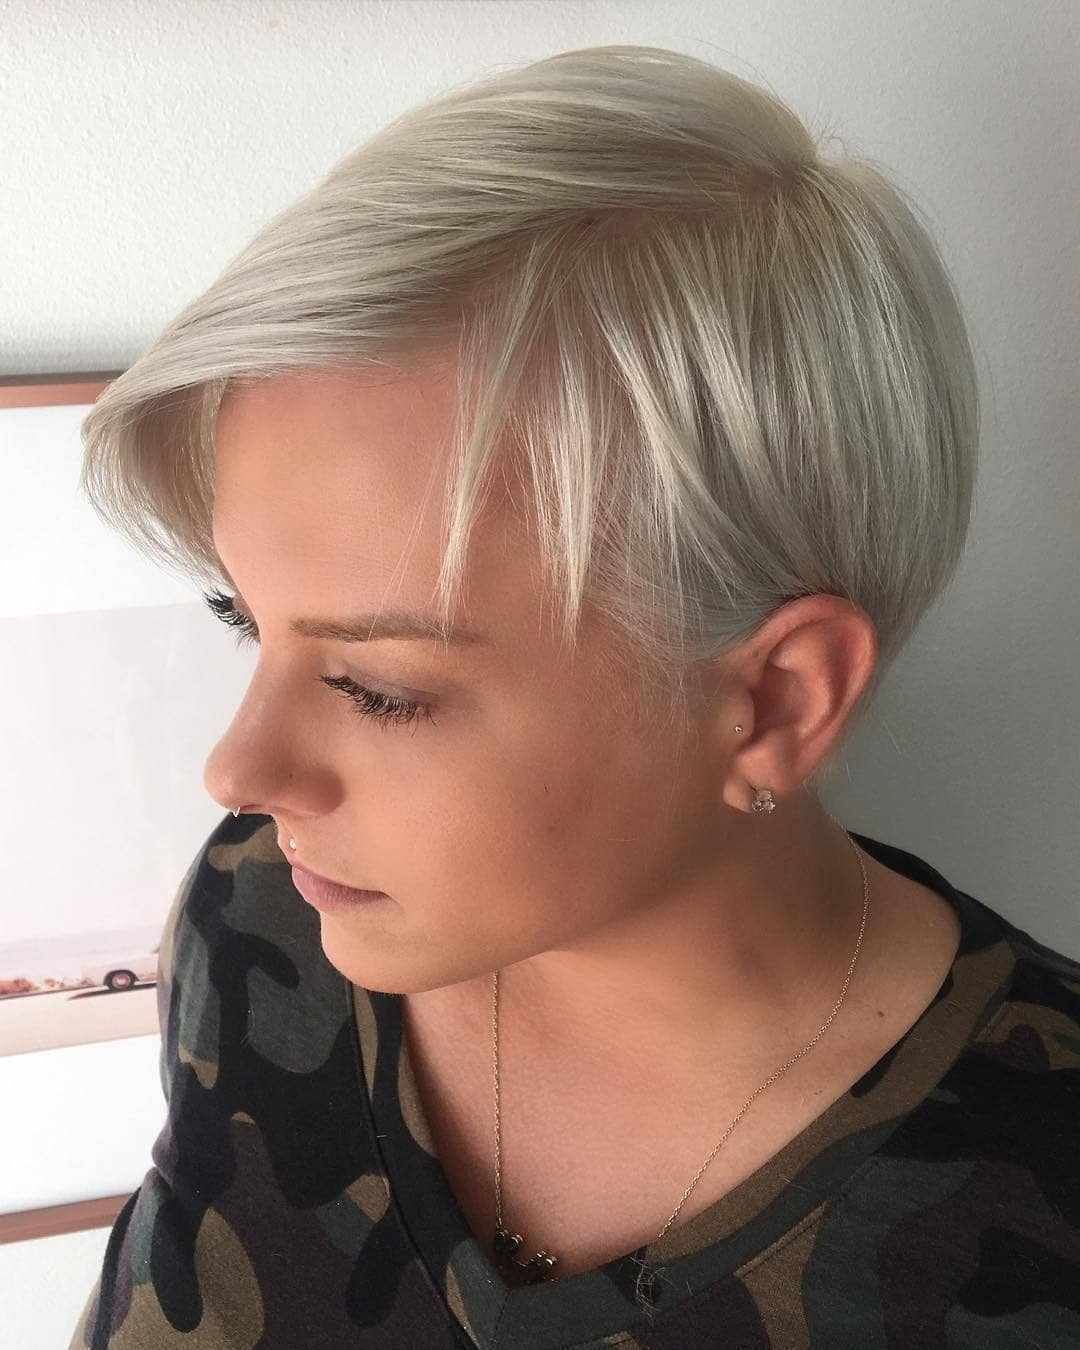 70 best short pixie cut hairstyles 2019 - cute pixie